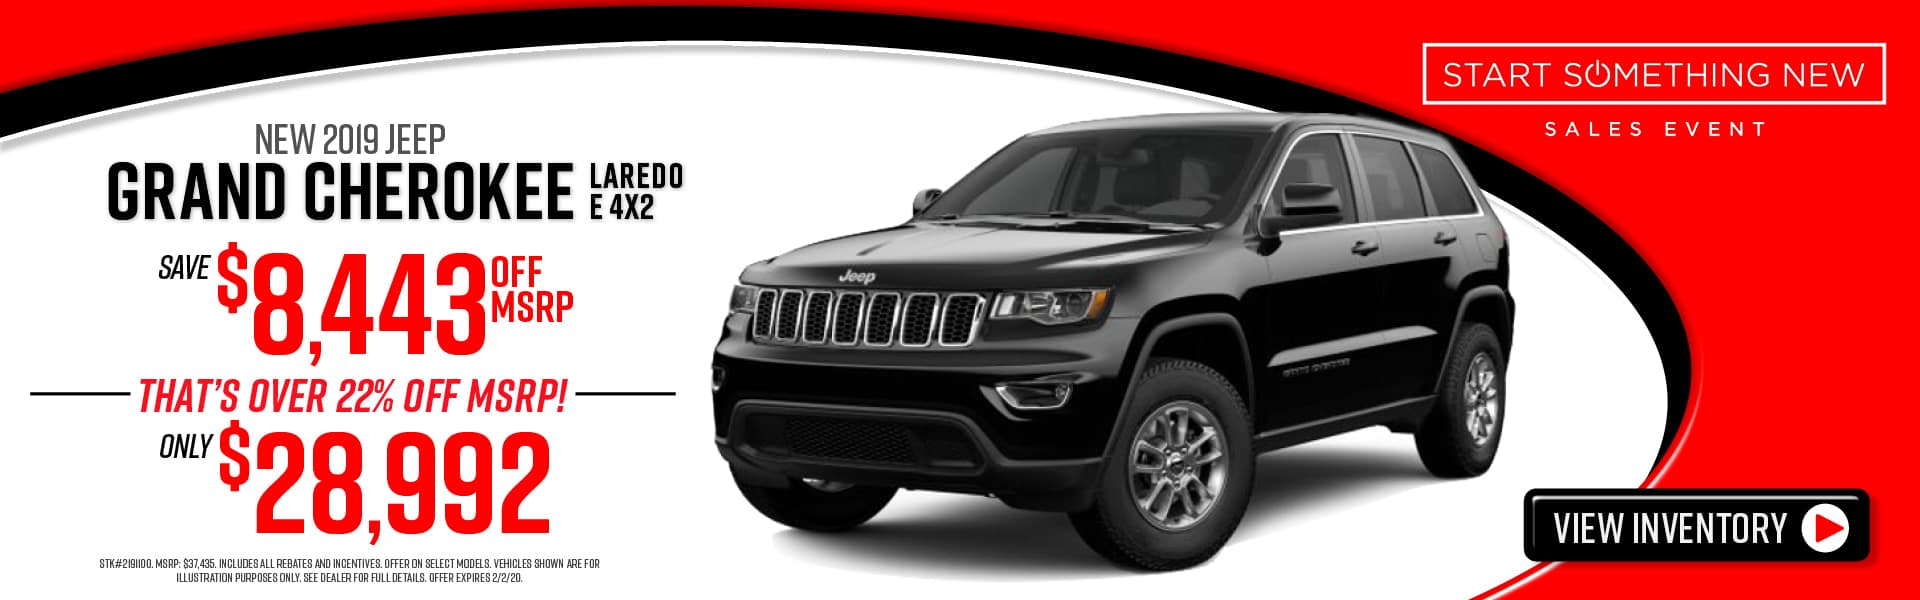 Used Cars Augusta Ga >> Dodge Chrysler Jeep Ram Fiat Dealer Augusta Martinez Ga